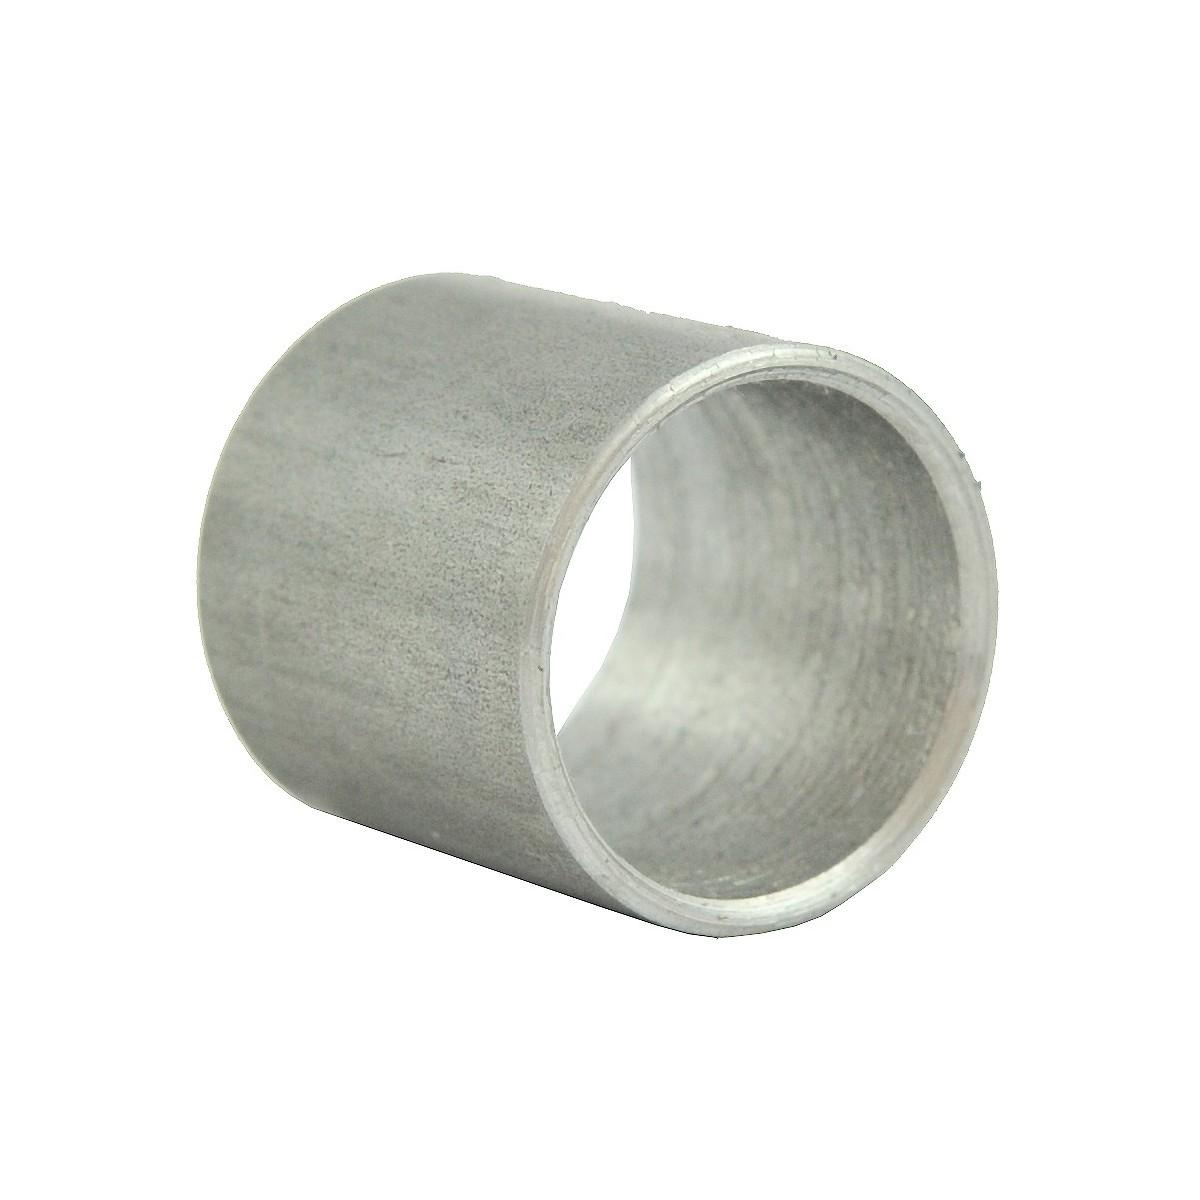 Sleeve bushing 22x25x24 mm ring